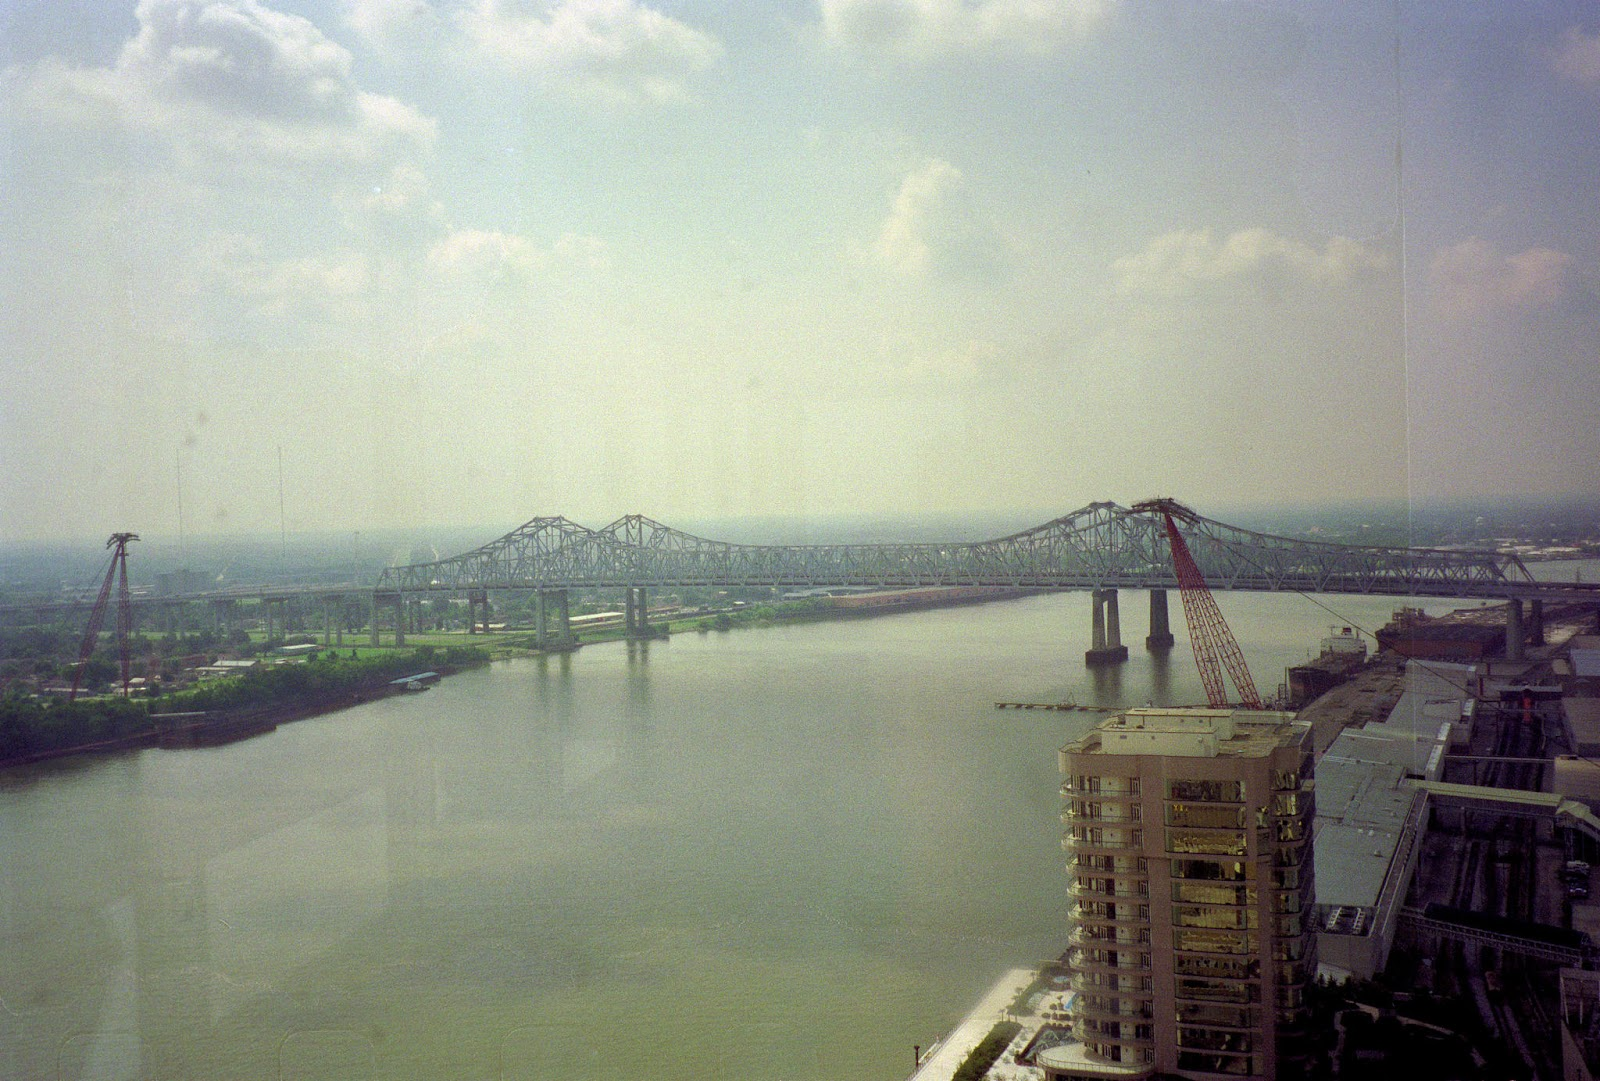 Over the Mississippi